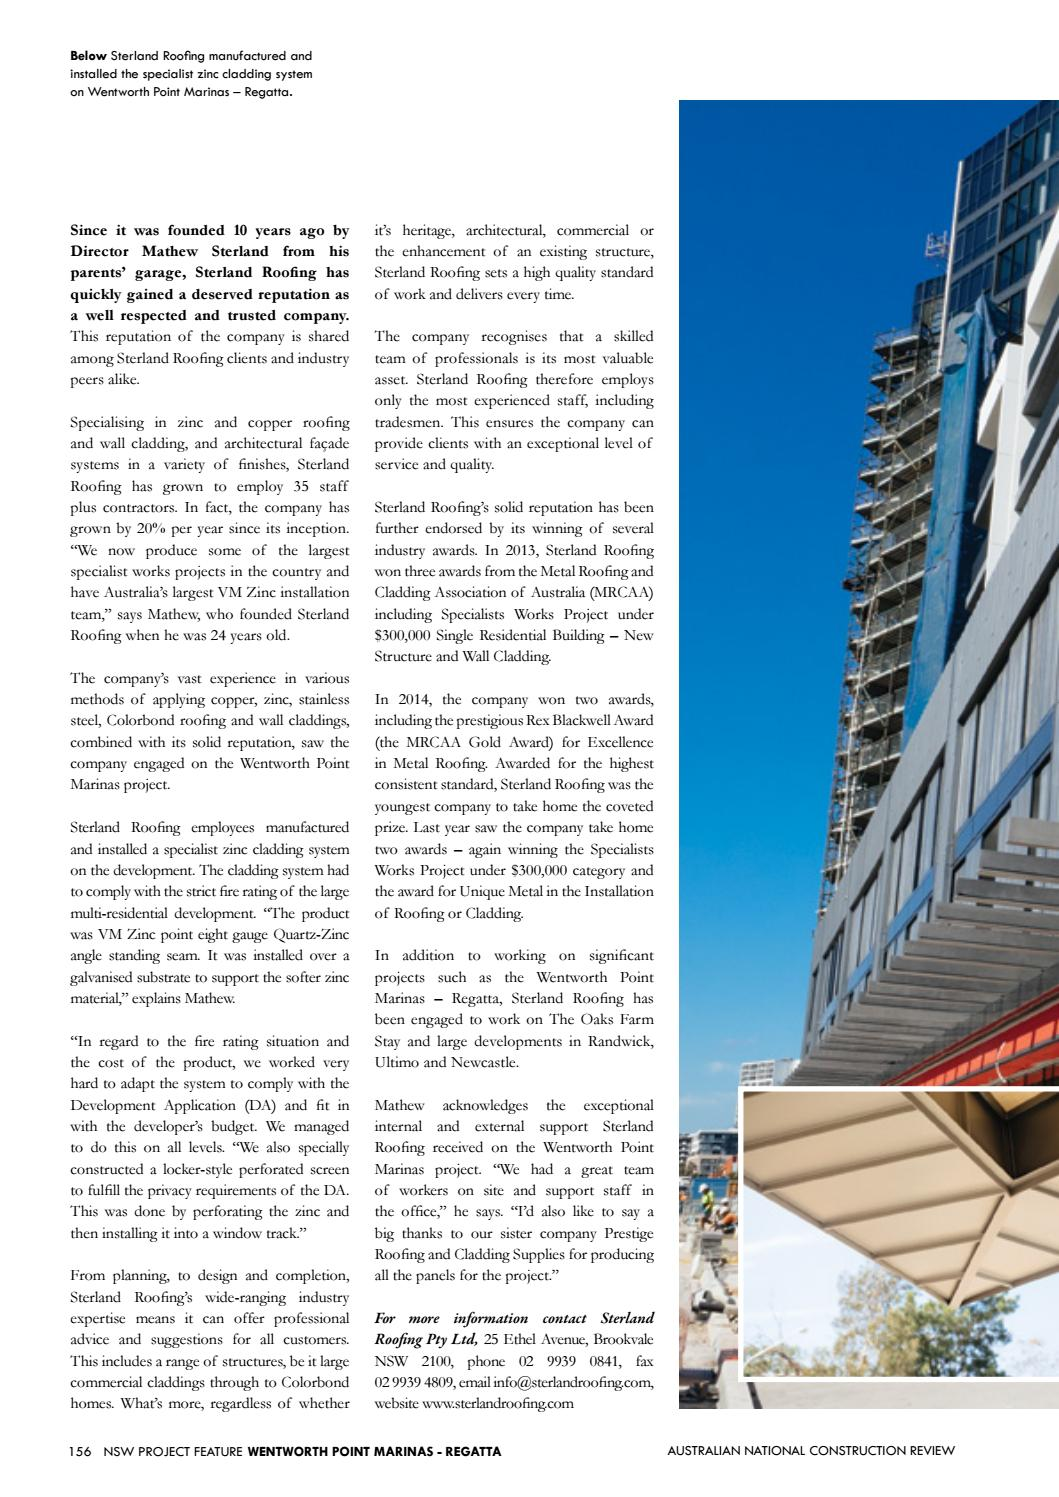 Australian National Construction Review